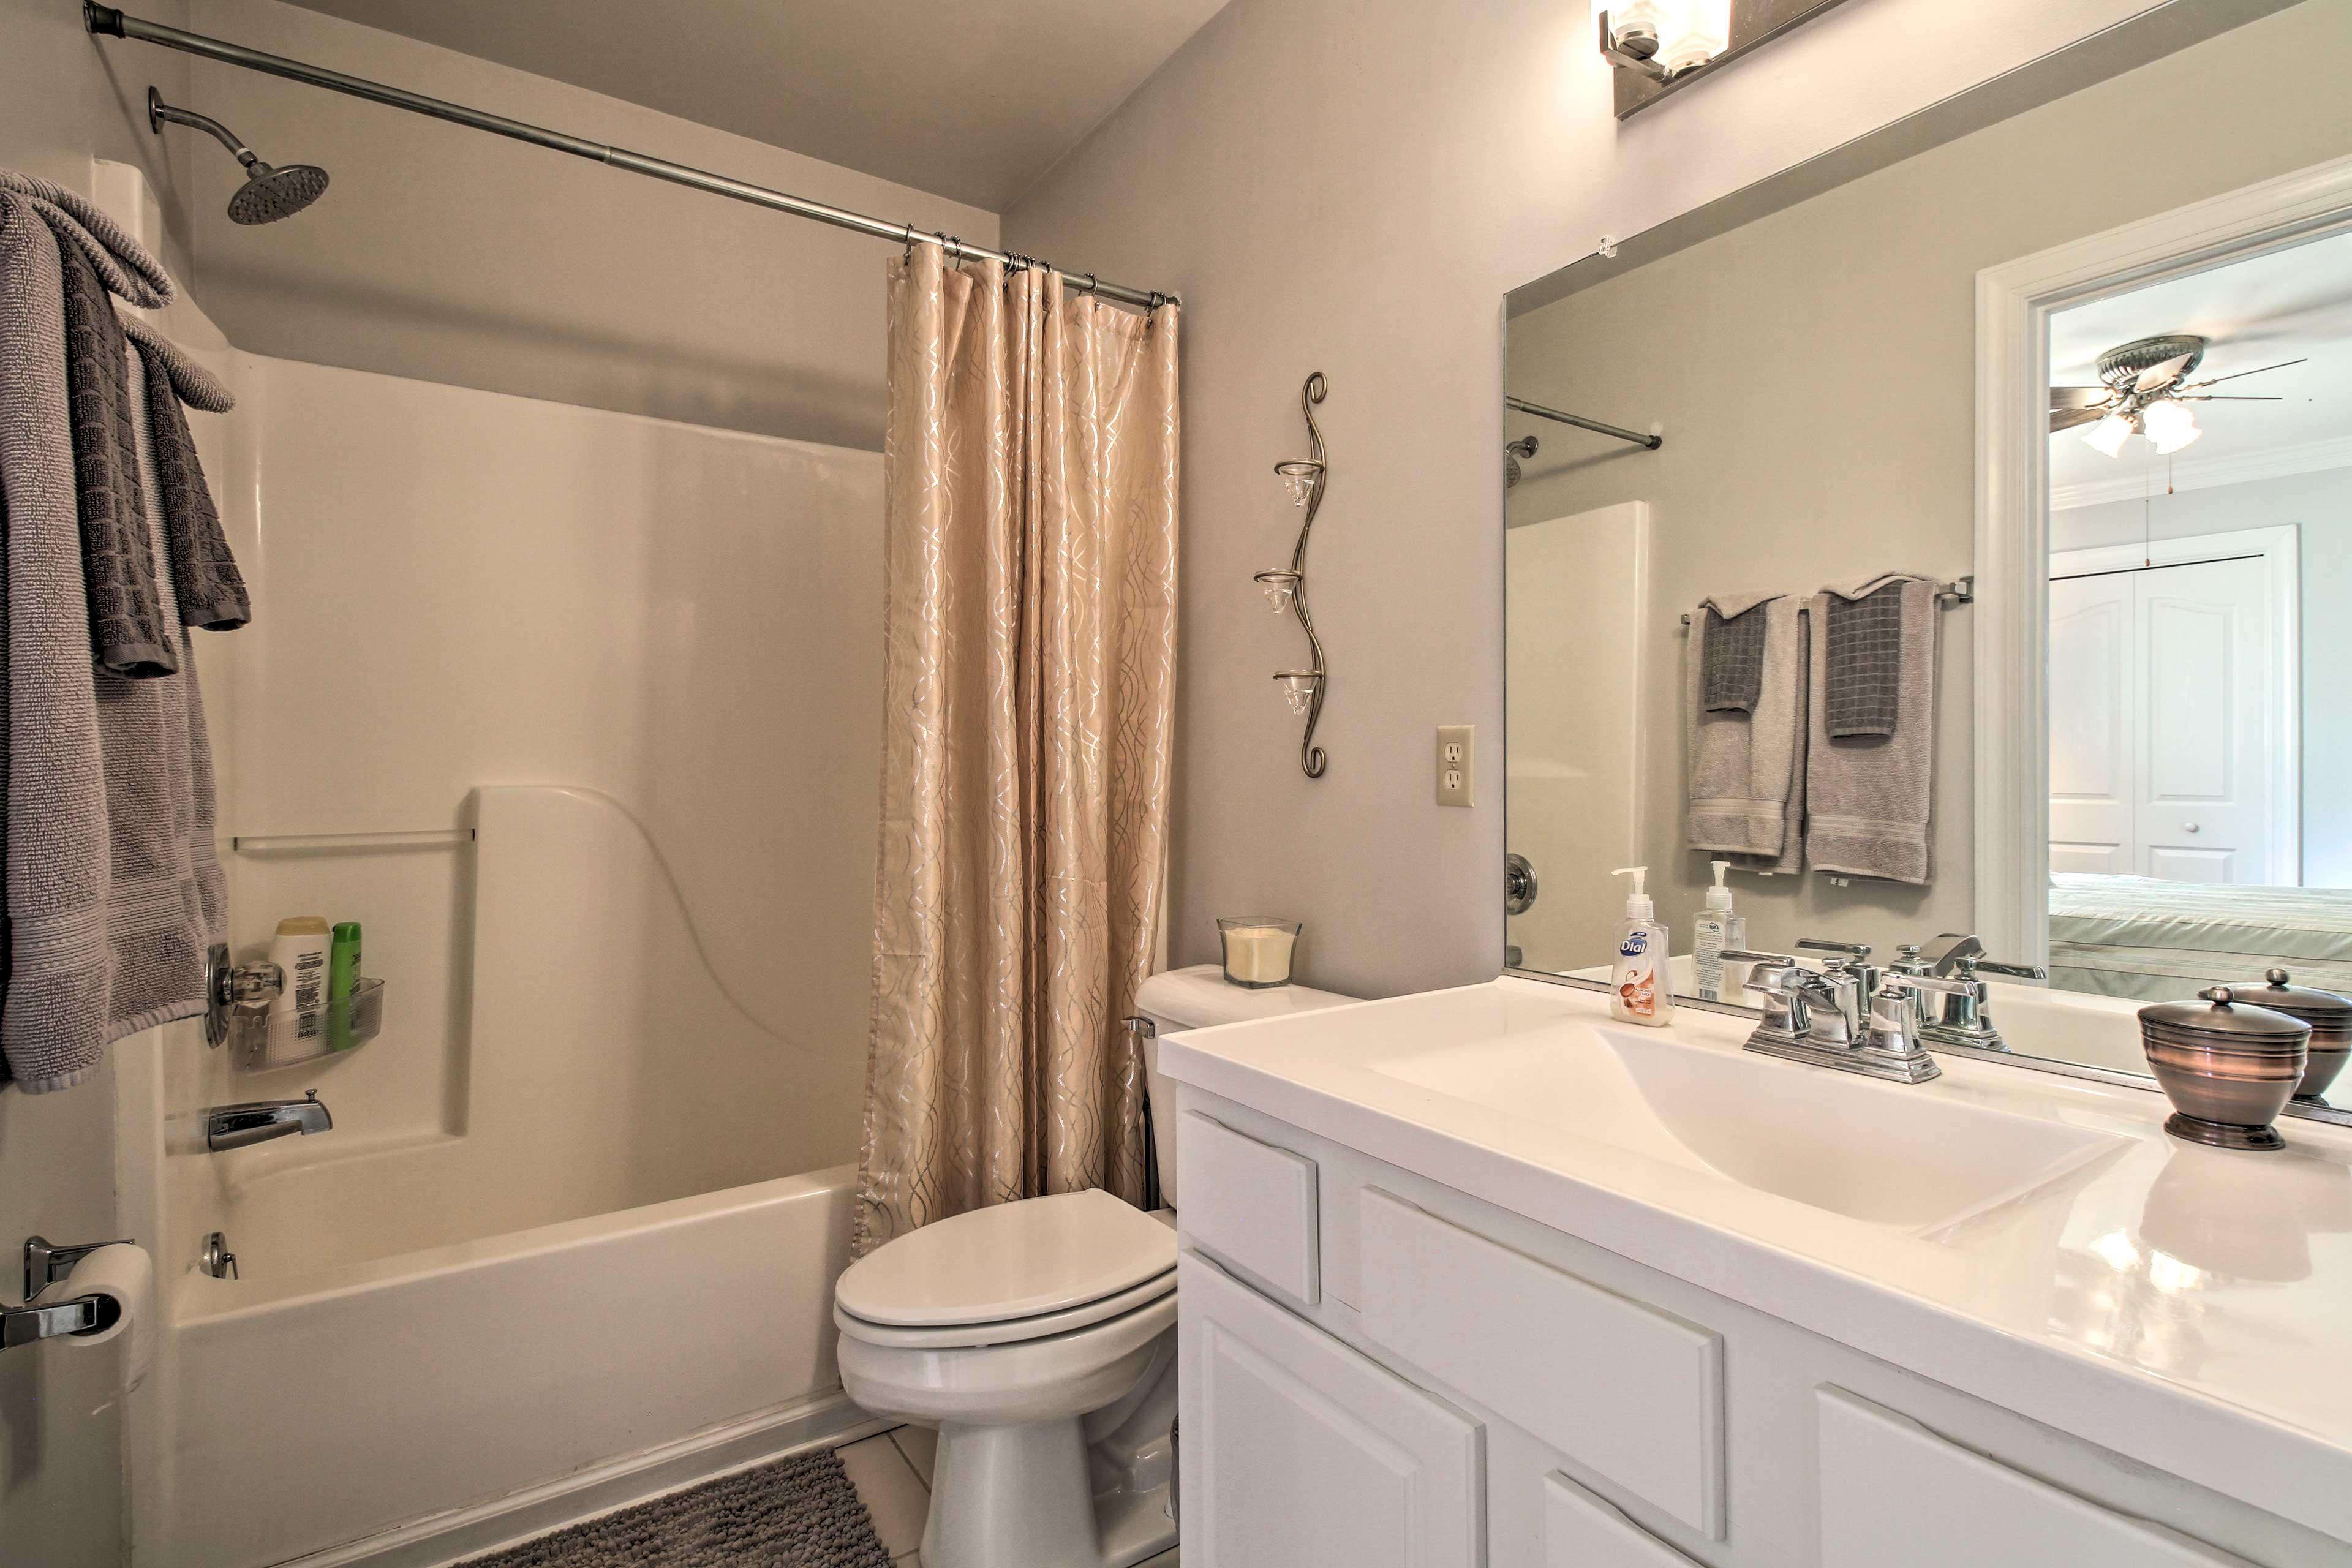 The full bathroom hosts a shower/tub combo.